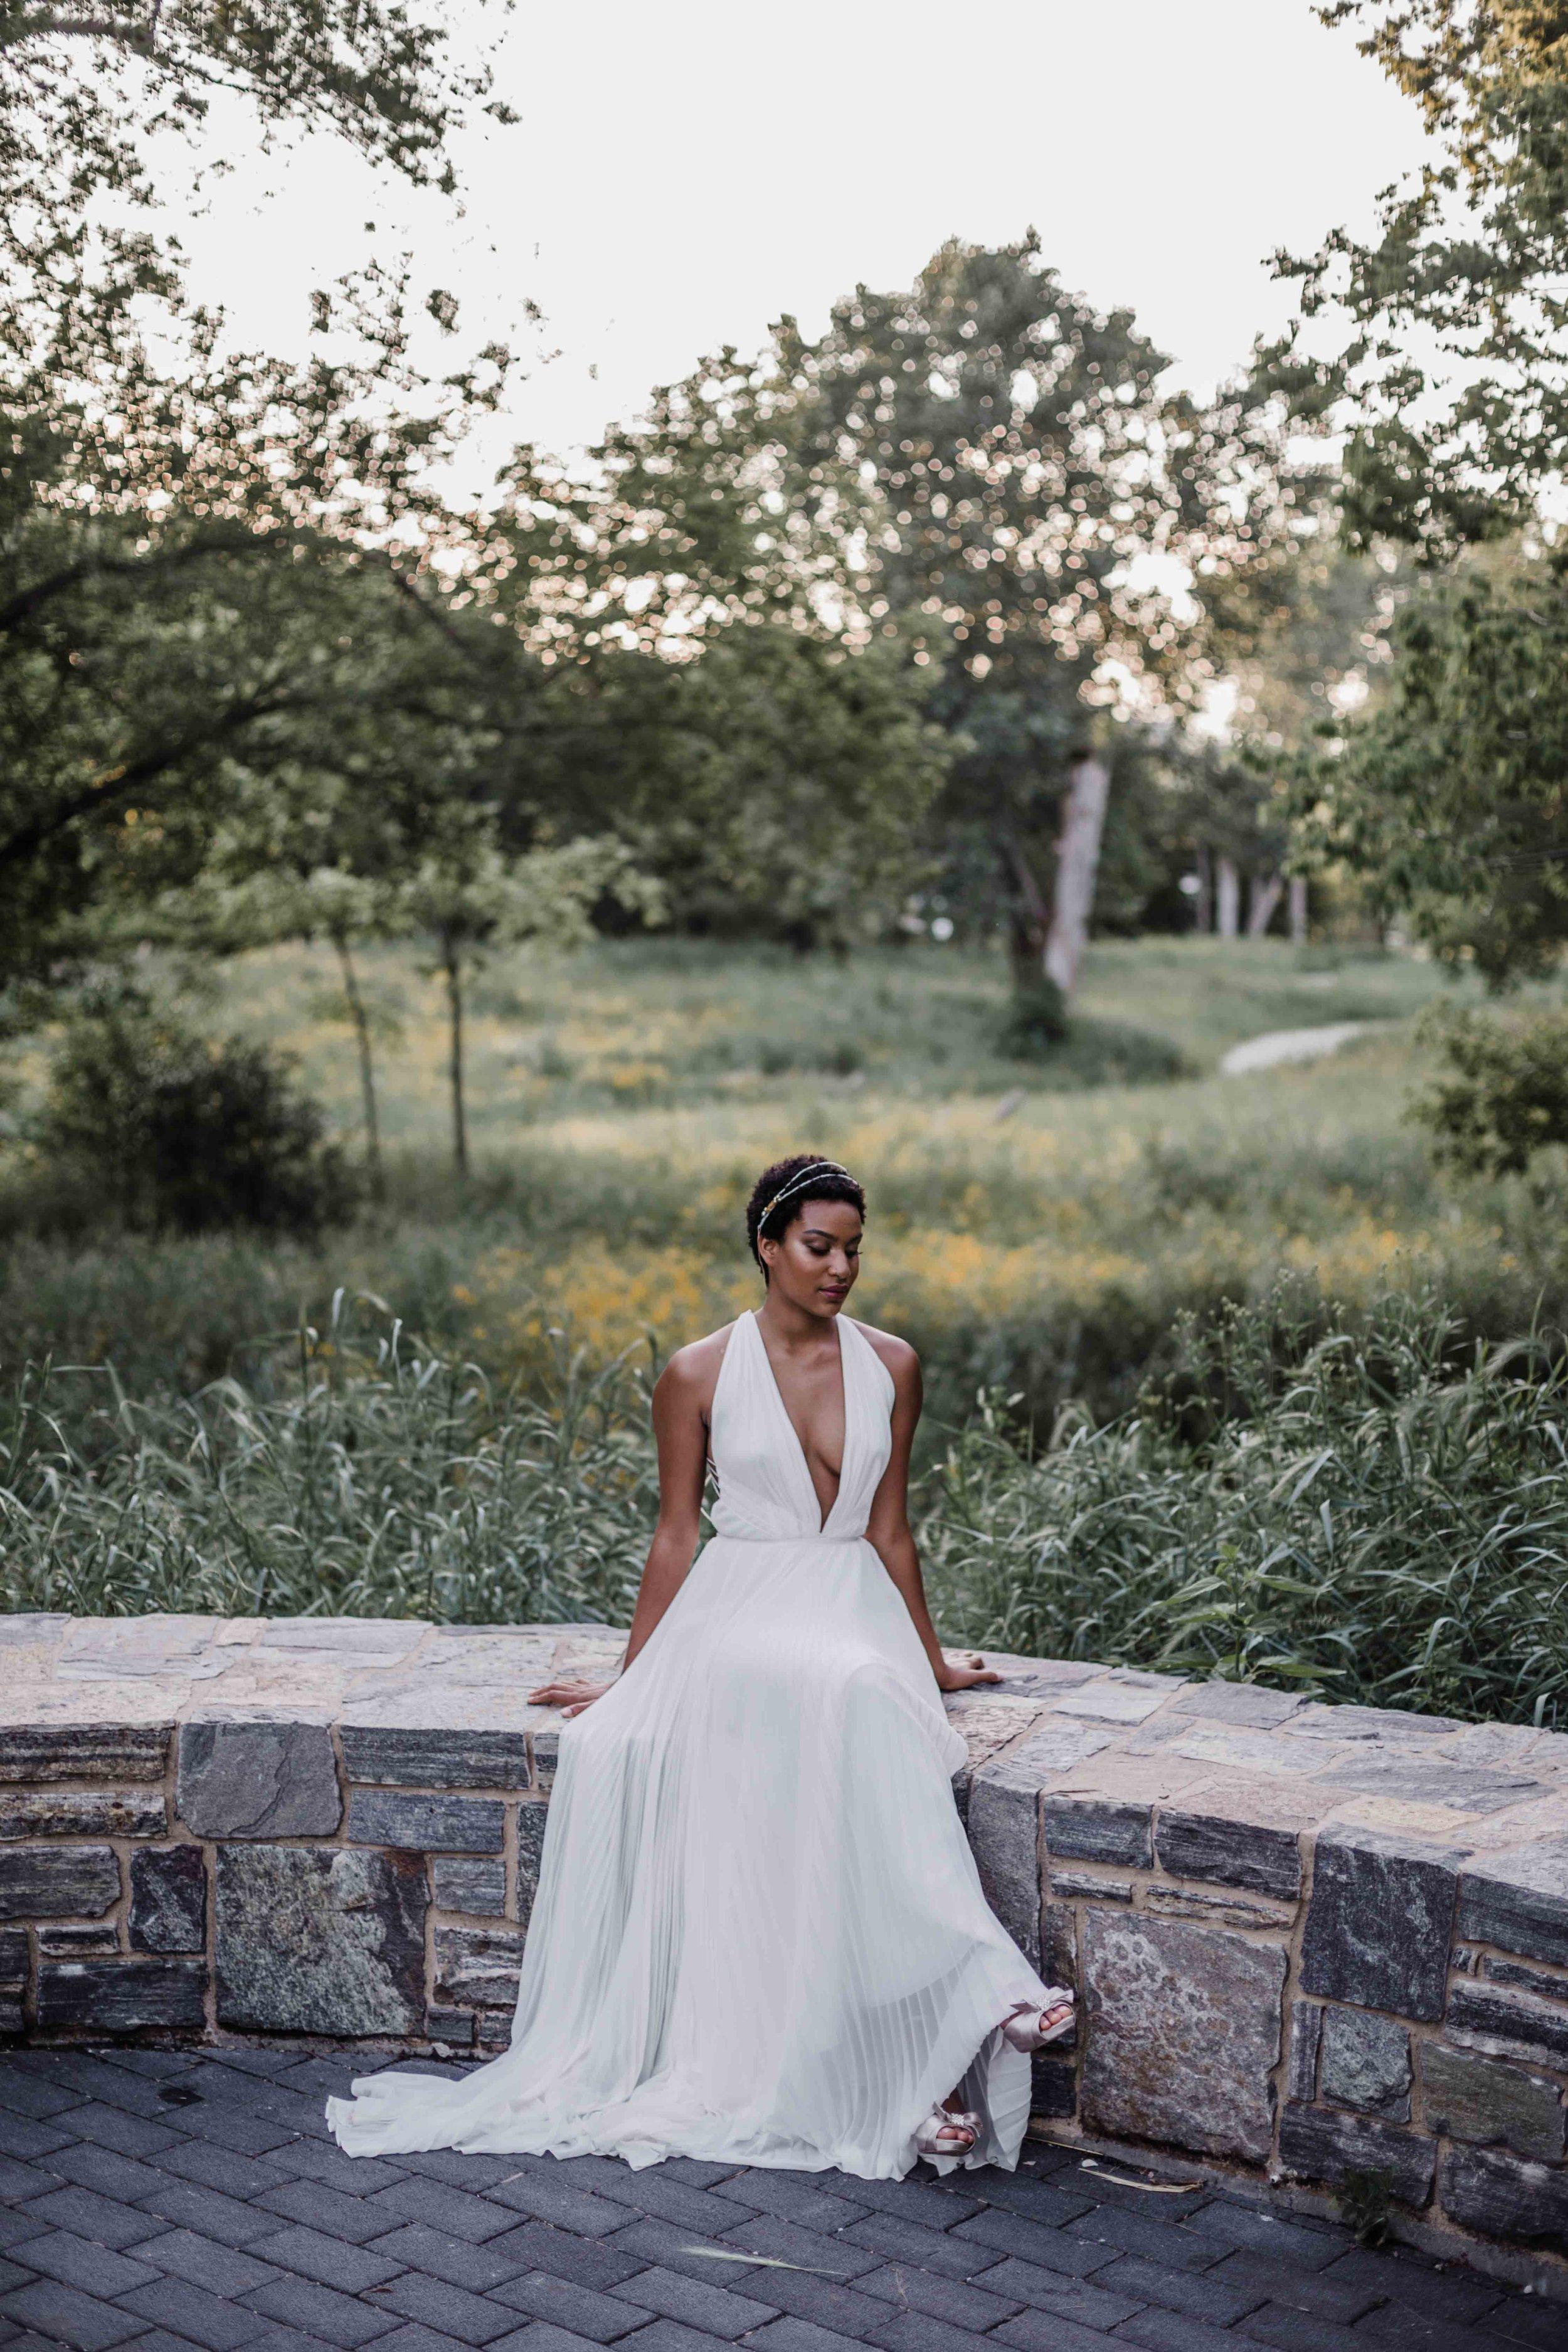 Bridal elopement photography inspiration